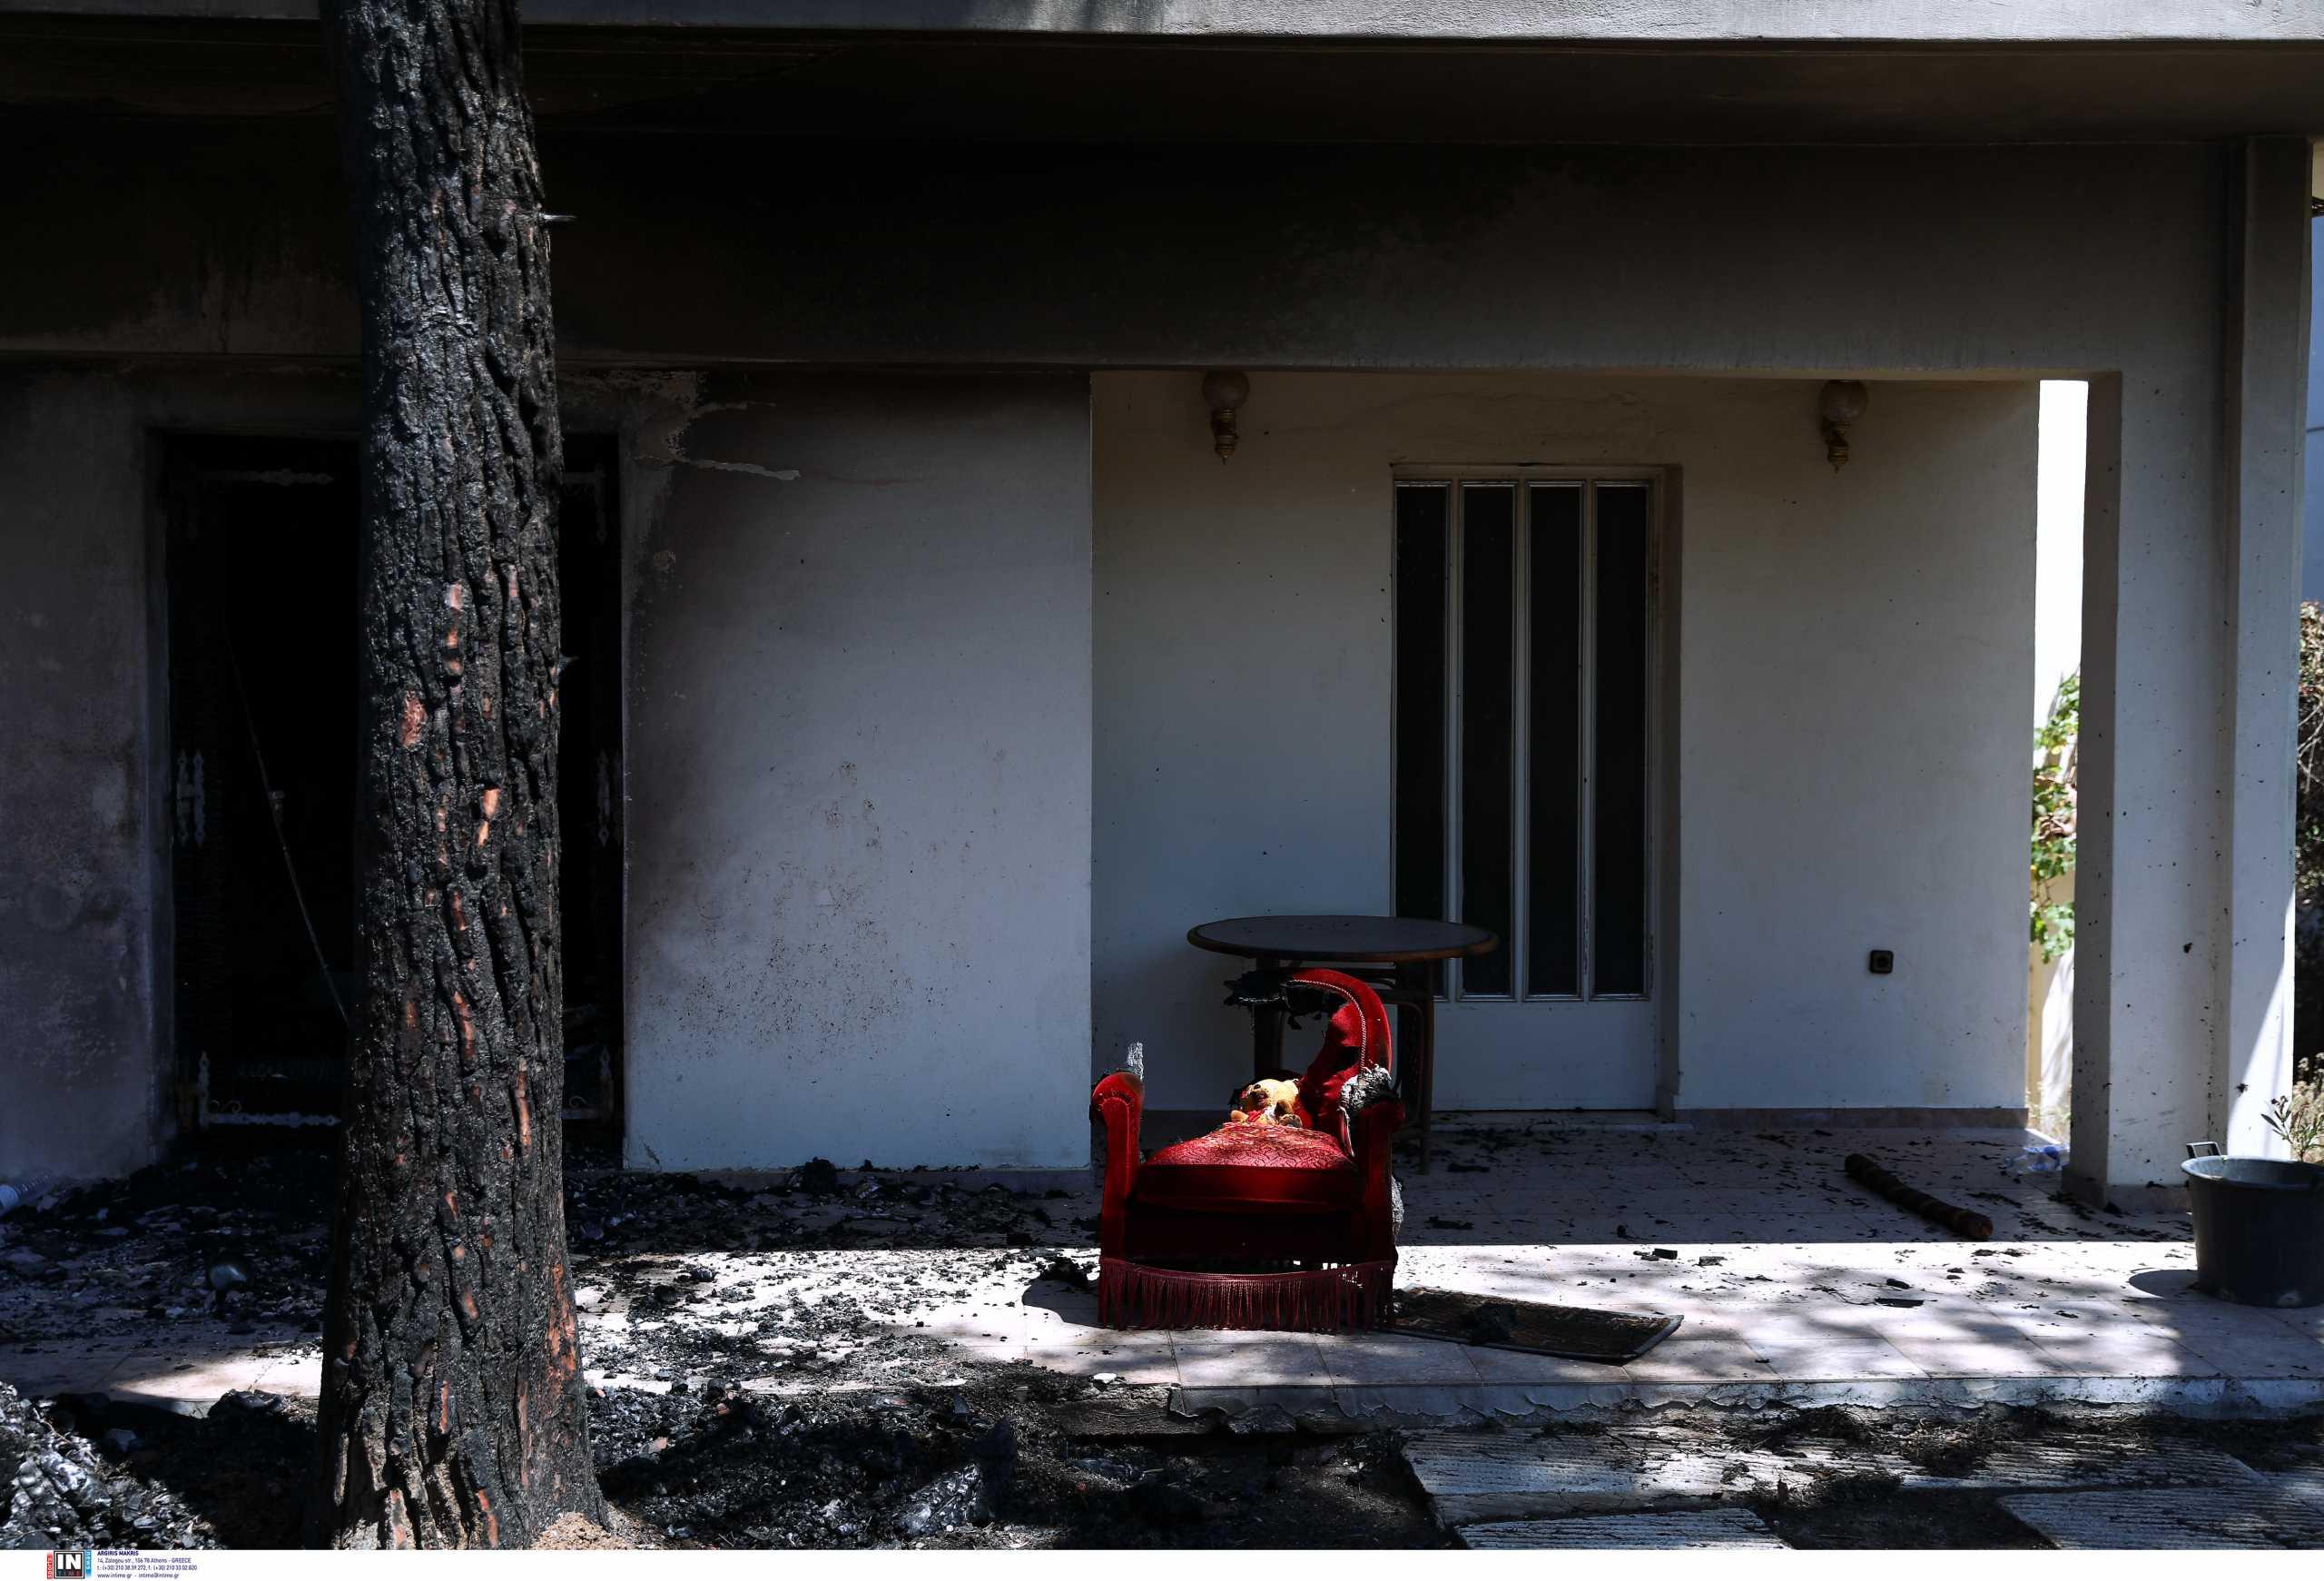 arogi.gov.gr: Αυτοί οι πυρόπληκτοι αποζημιώθηκαν ήδη – Κάθε Τρίτη και Παρασκευή οι πληρωμές